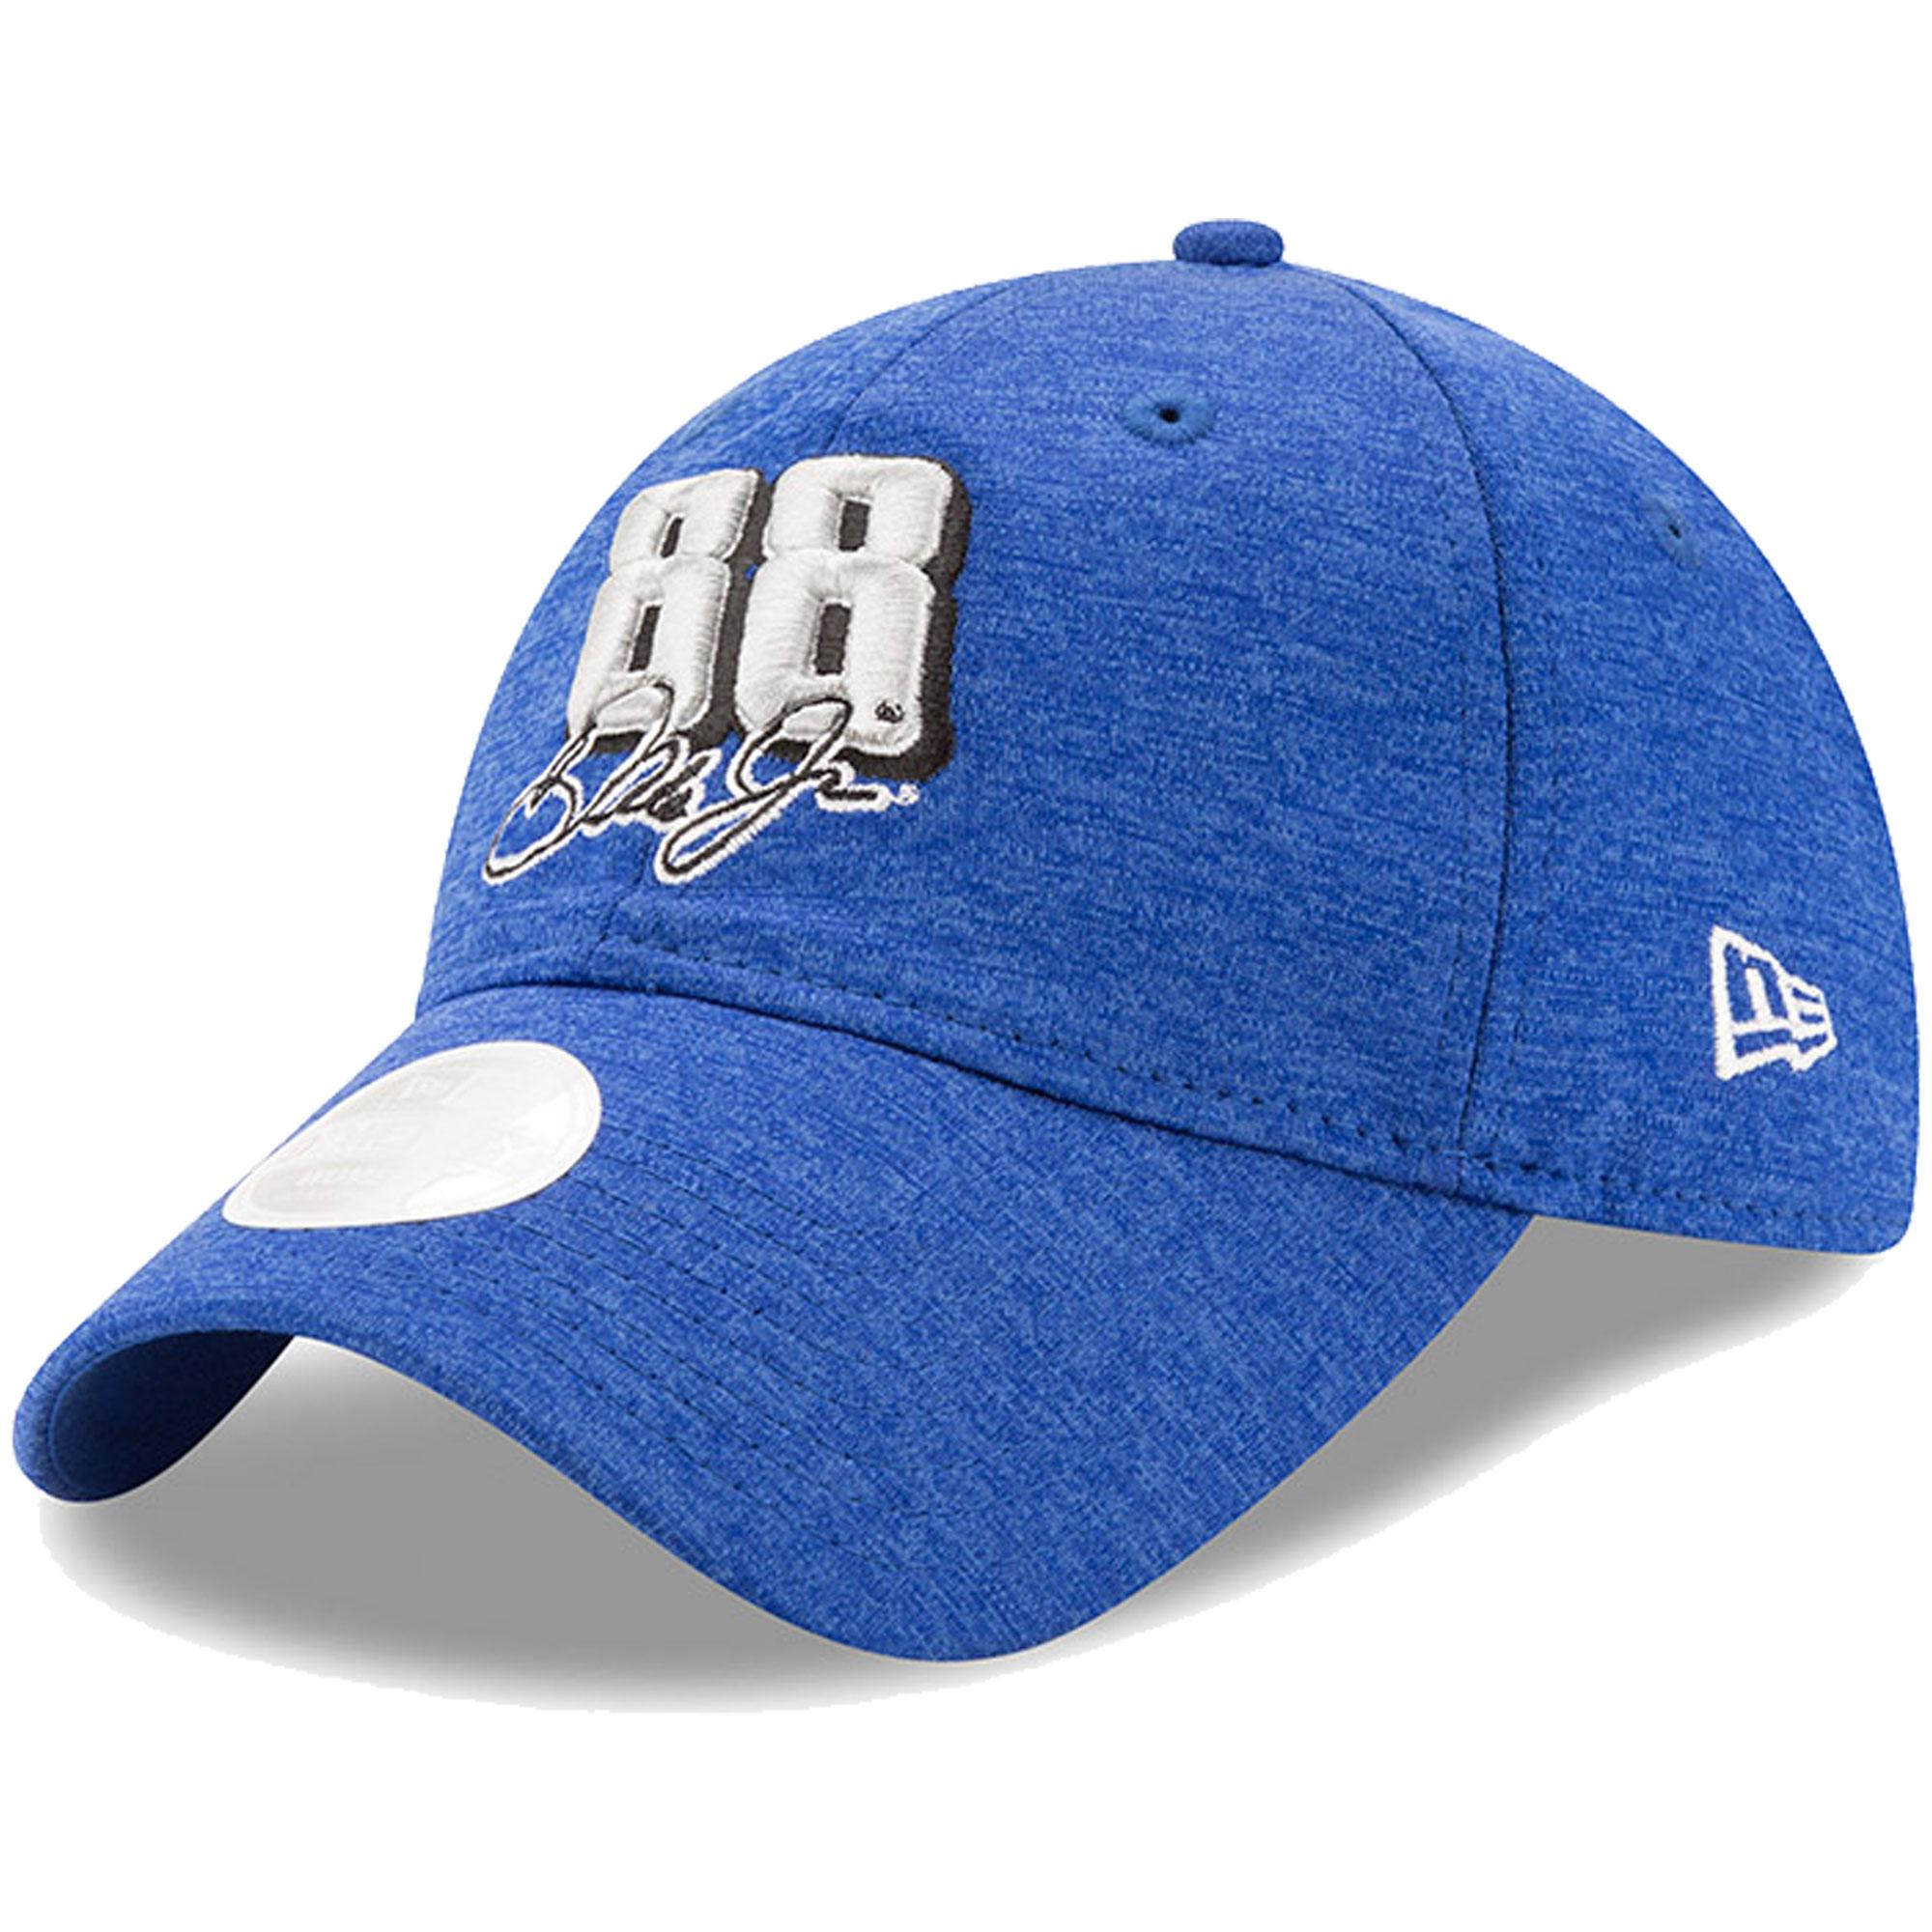 Dale Earnhardt Jr. New Era Women's Shadow Sleek 9TWENTY Adjustable Cap - Royal - OSFA